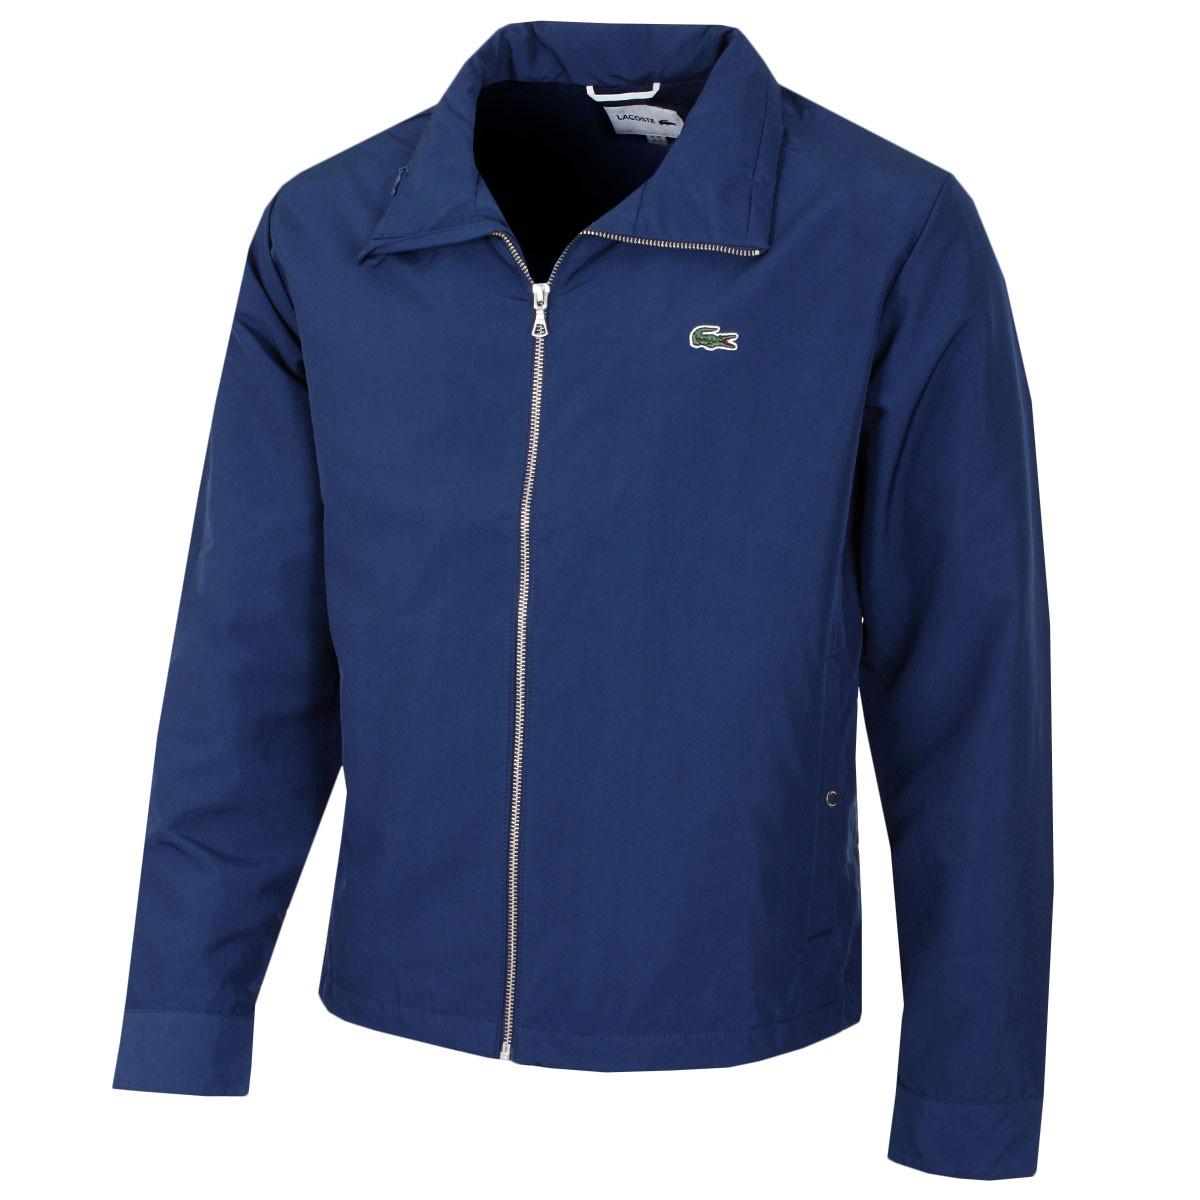 f56e5d2f284 Lacoste Mens BH2331 Full Zip Blouson Jacket - Lacoste - A-Z of ...